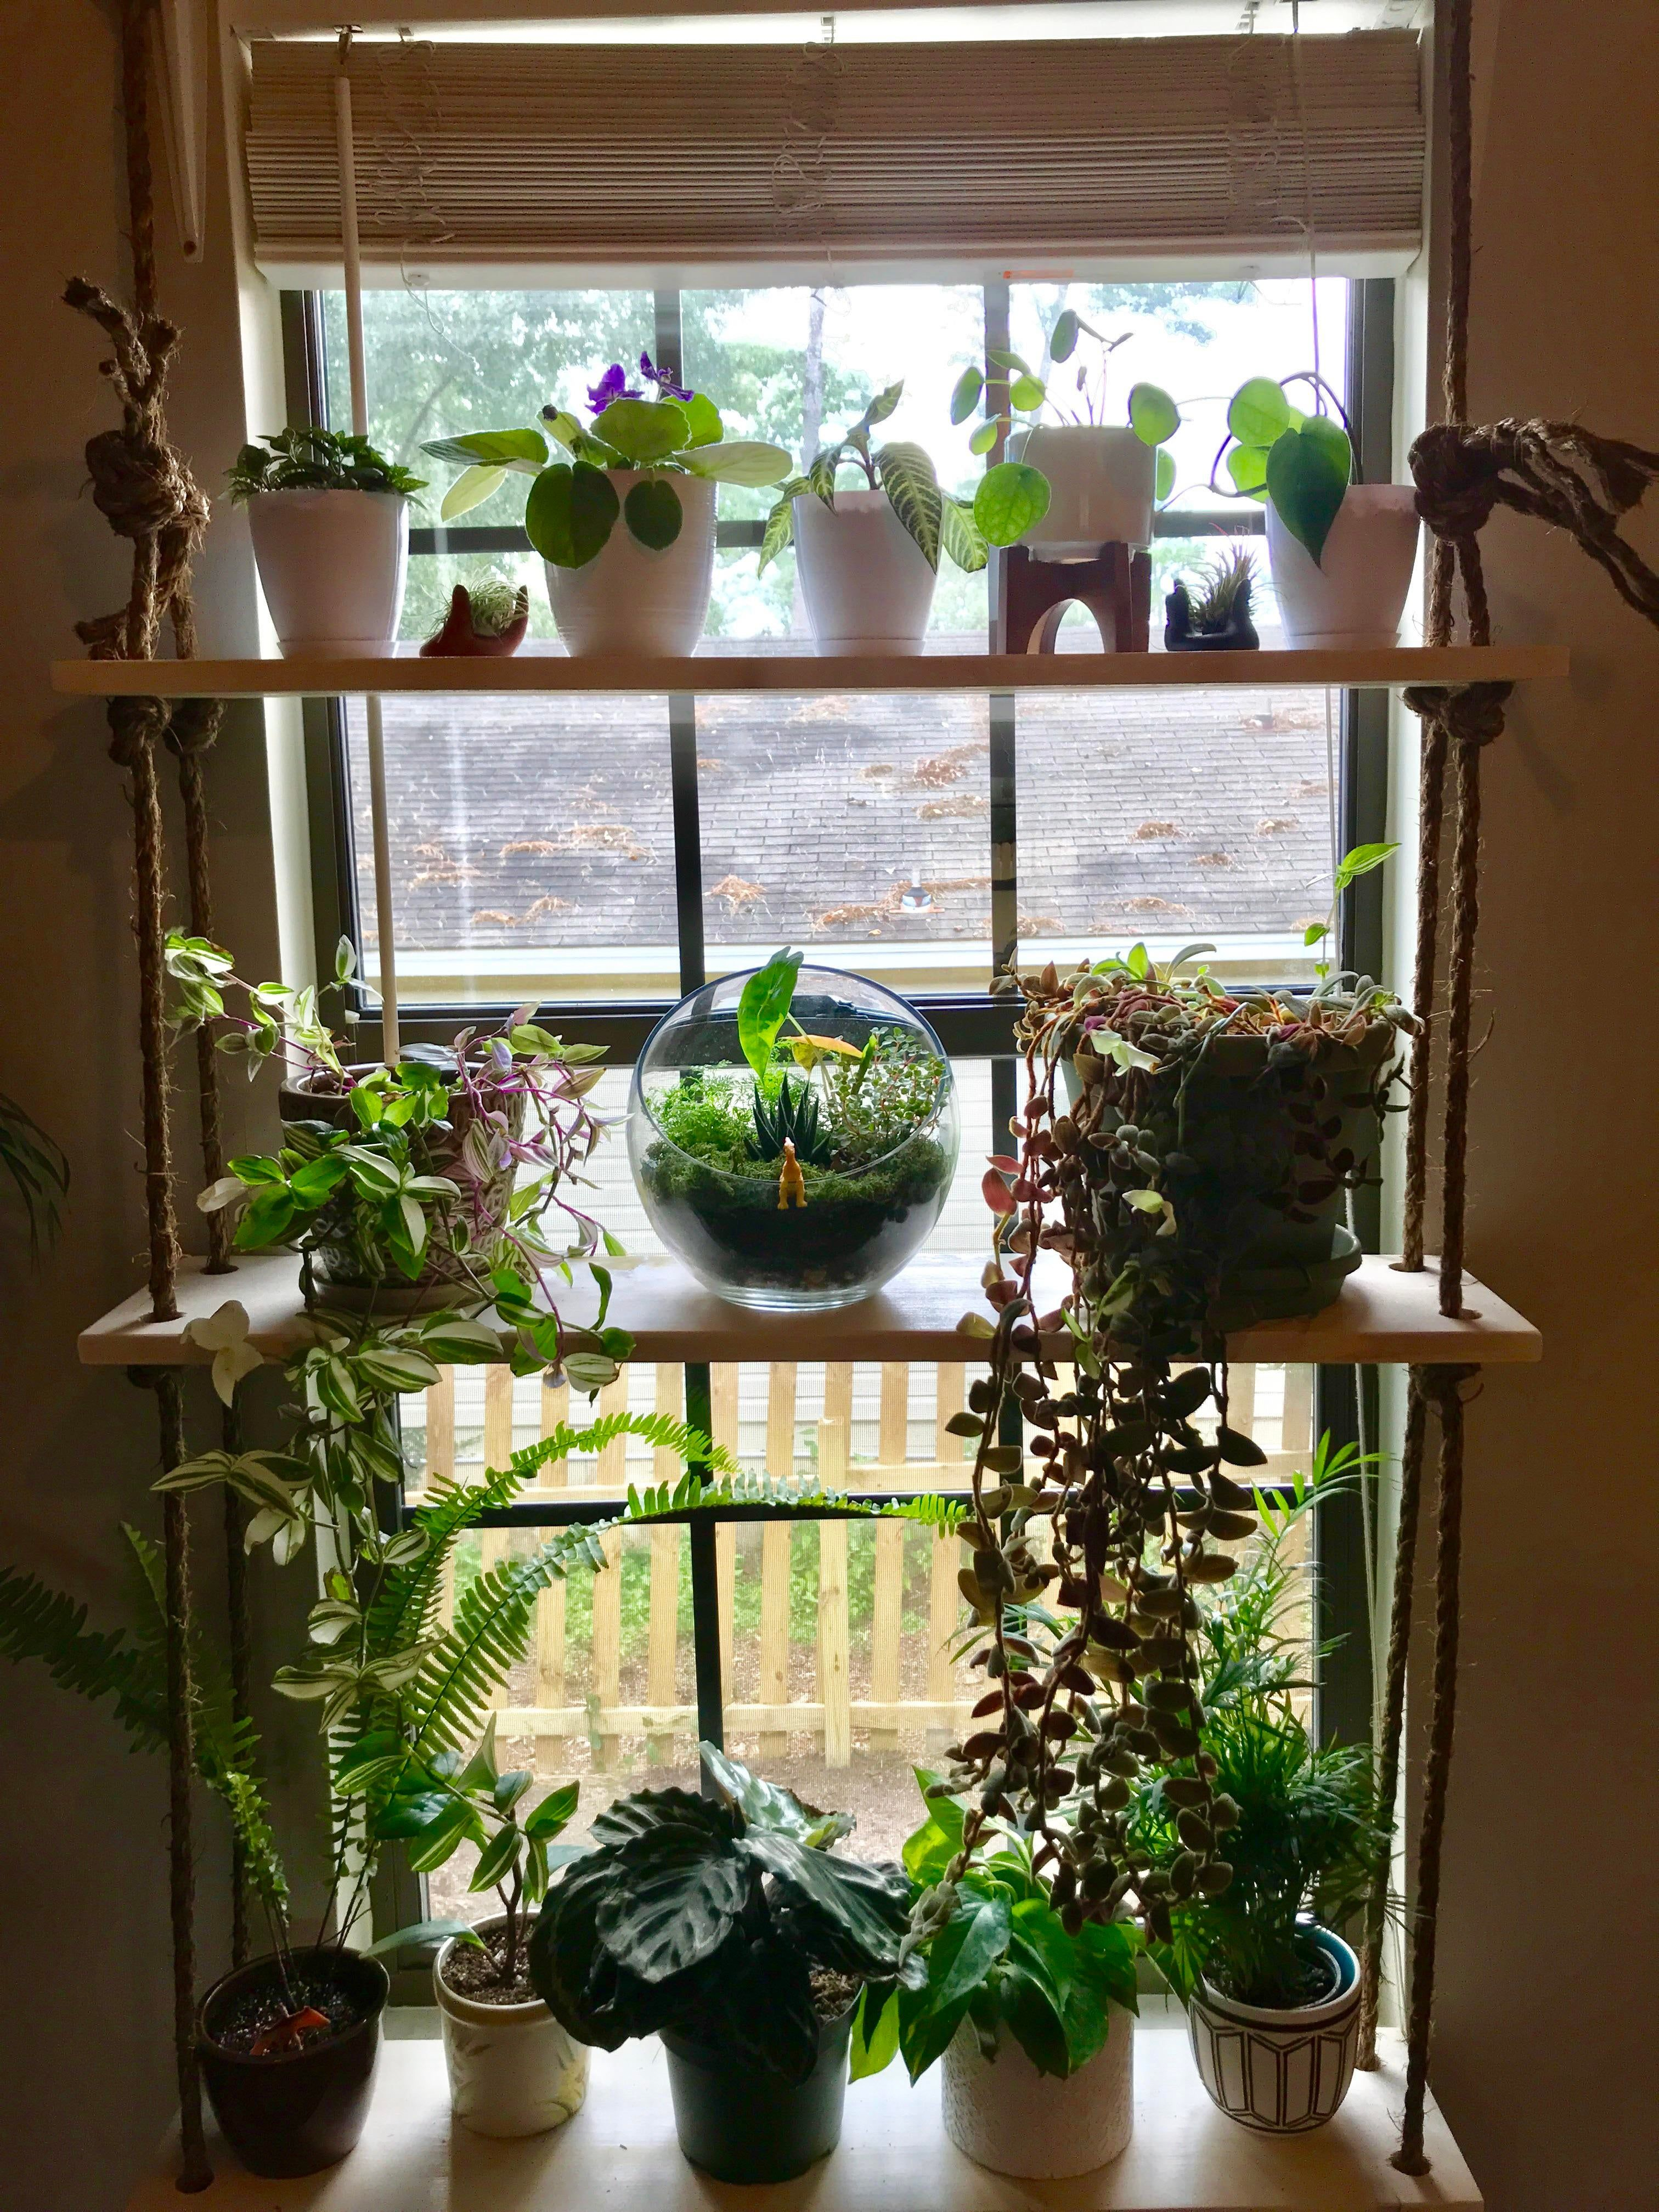 Attempt Babies Diy Lights Place Plant Shelf Struggling